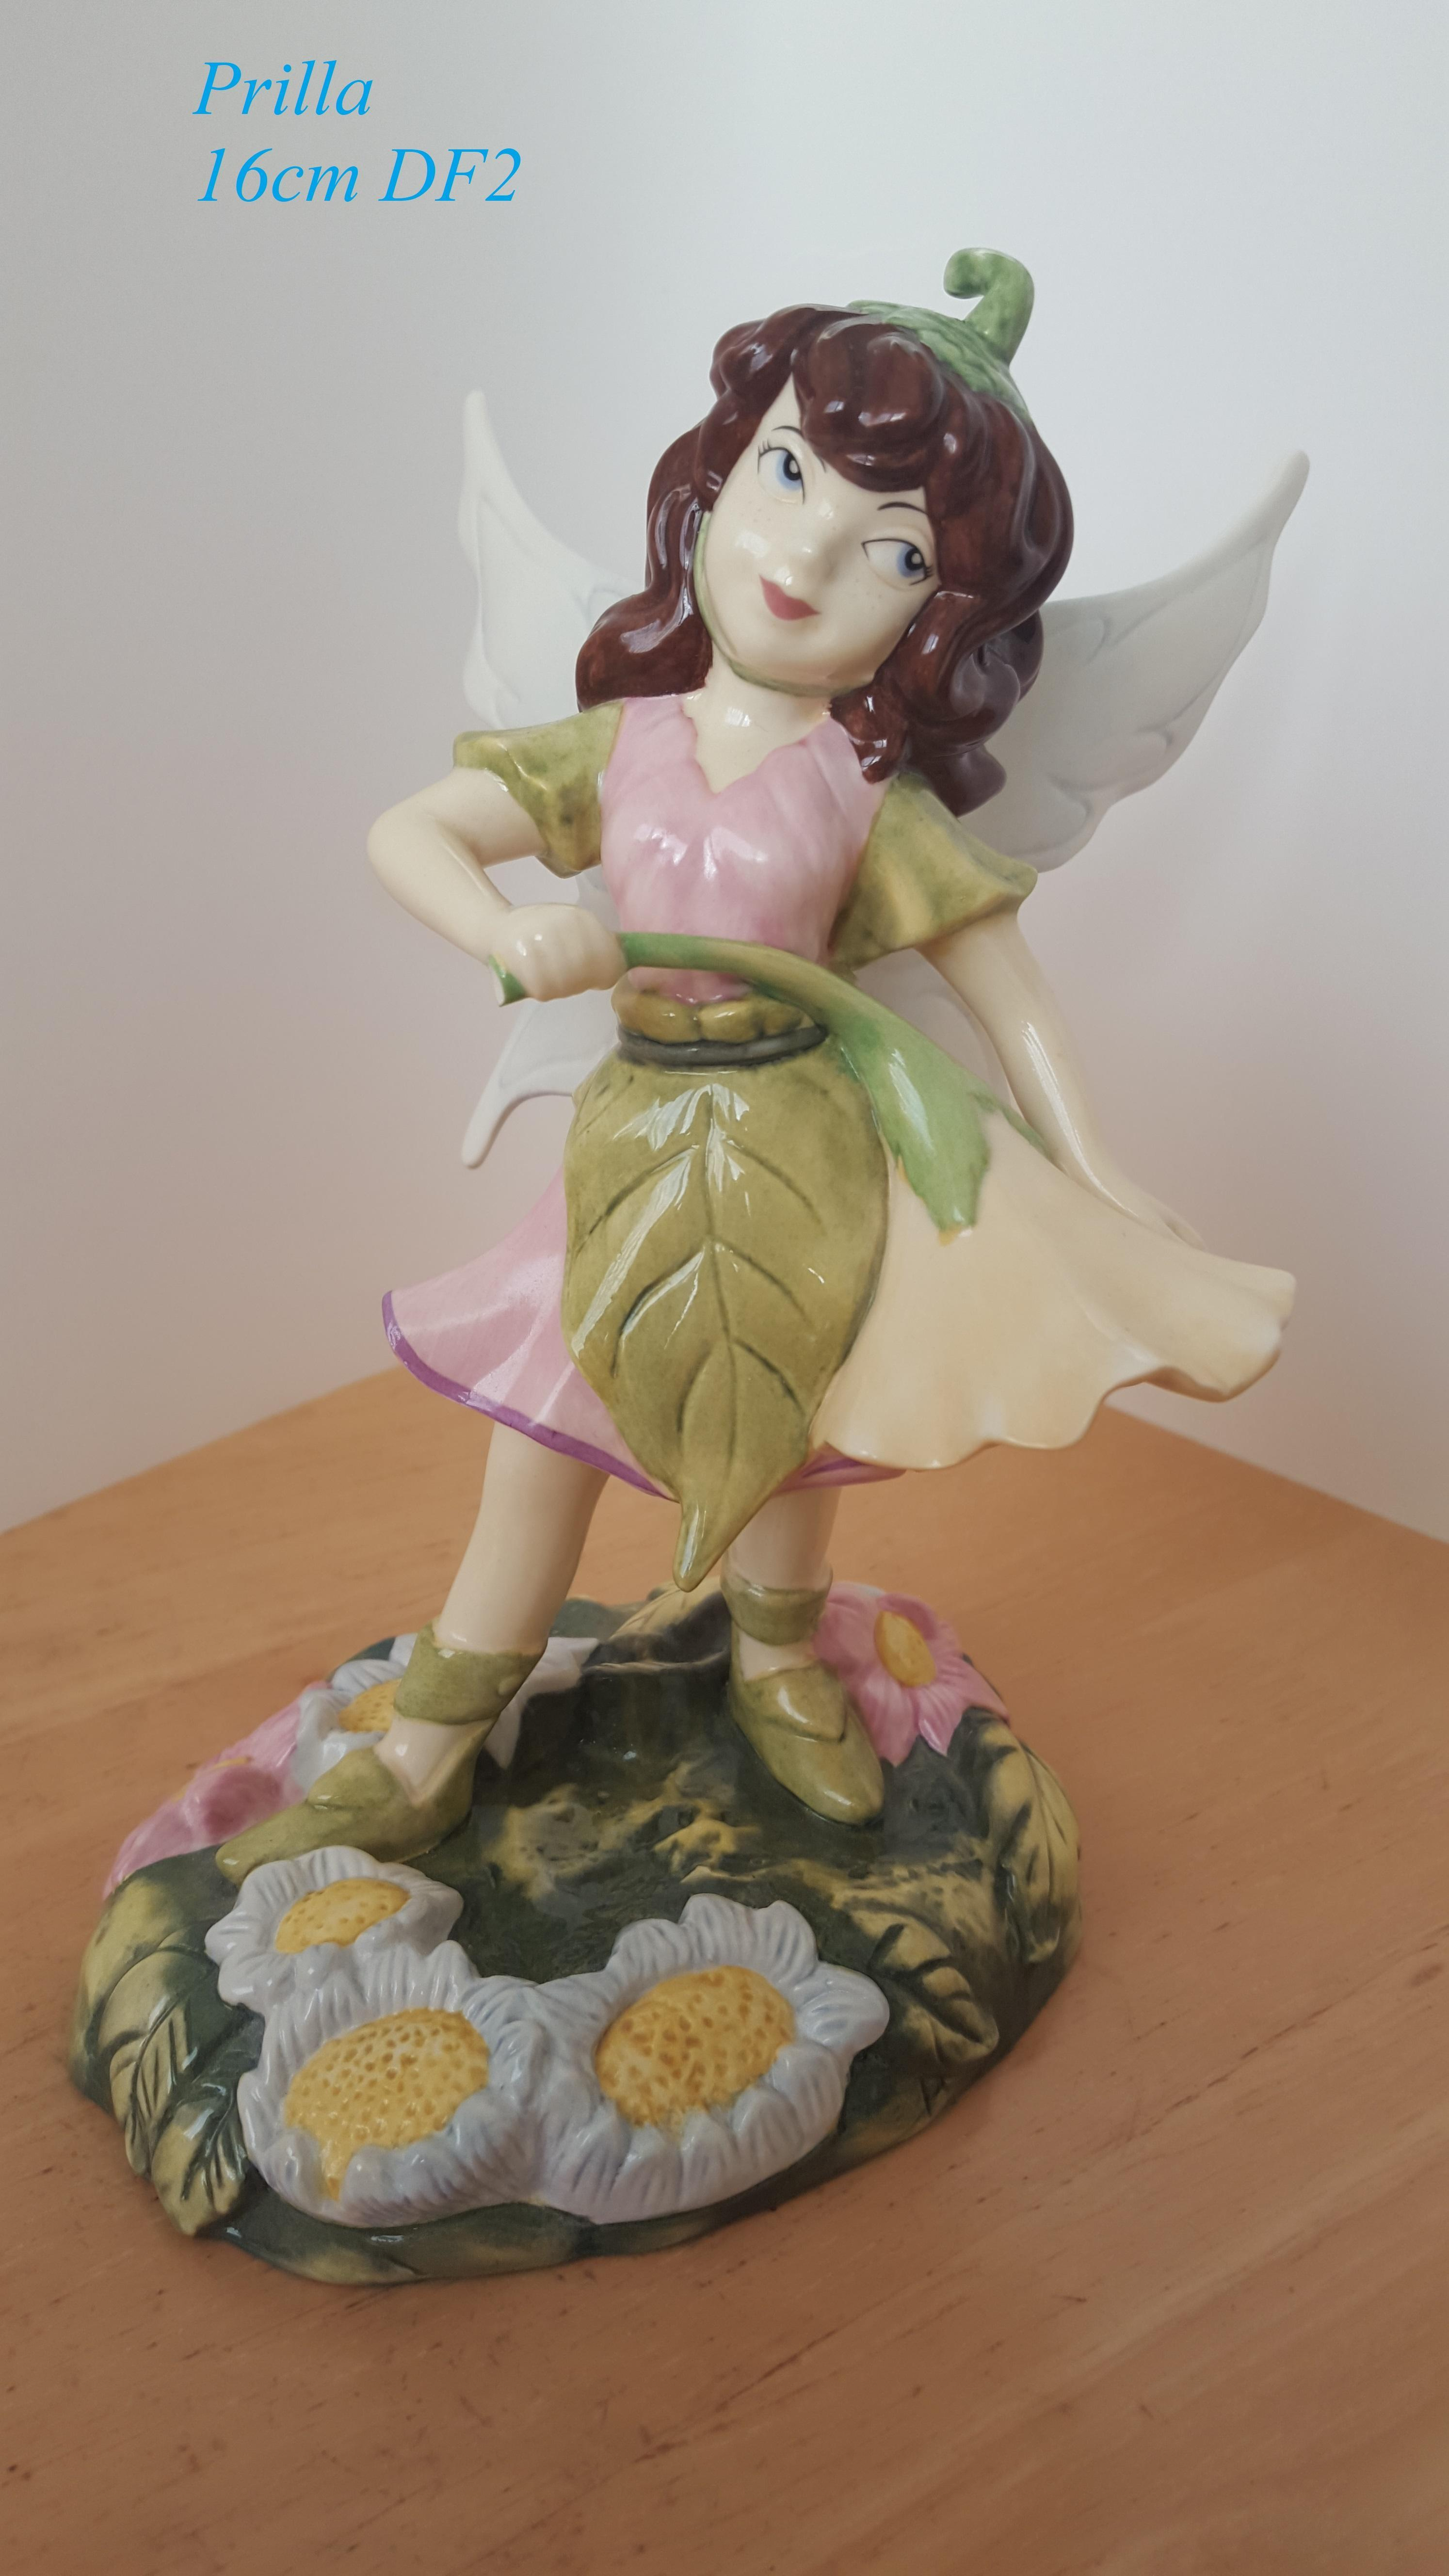 ROYAL DOULTON Disney Fairies Collection Figurine Prilla 16cm